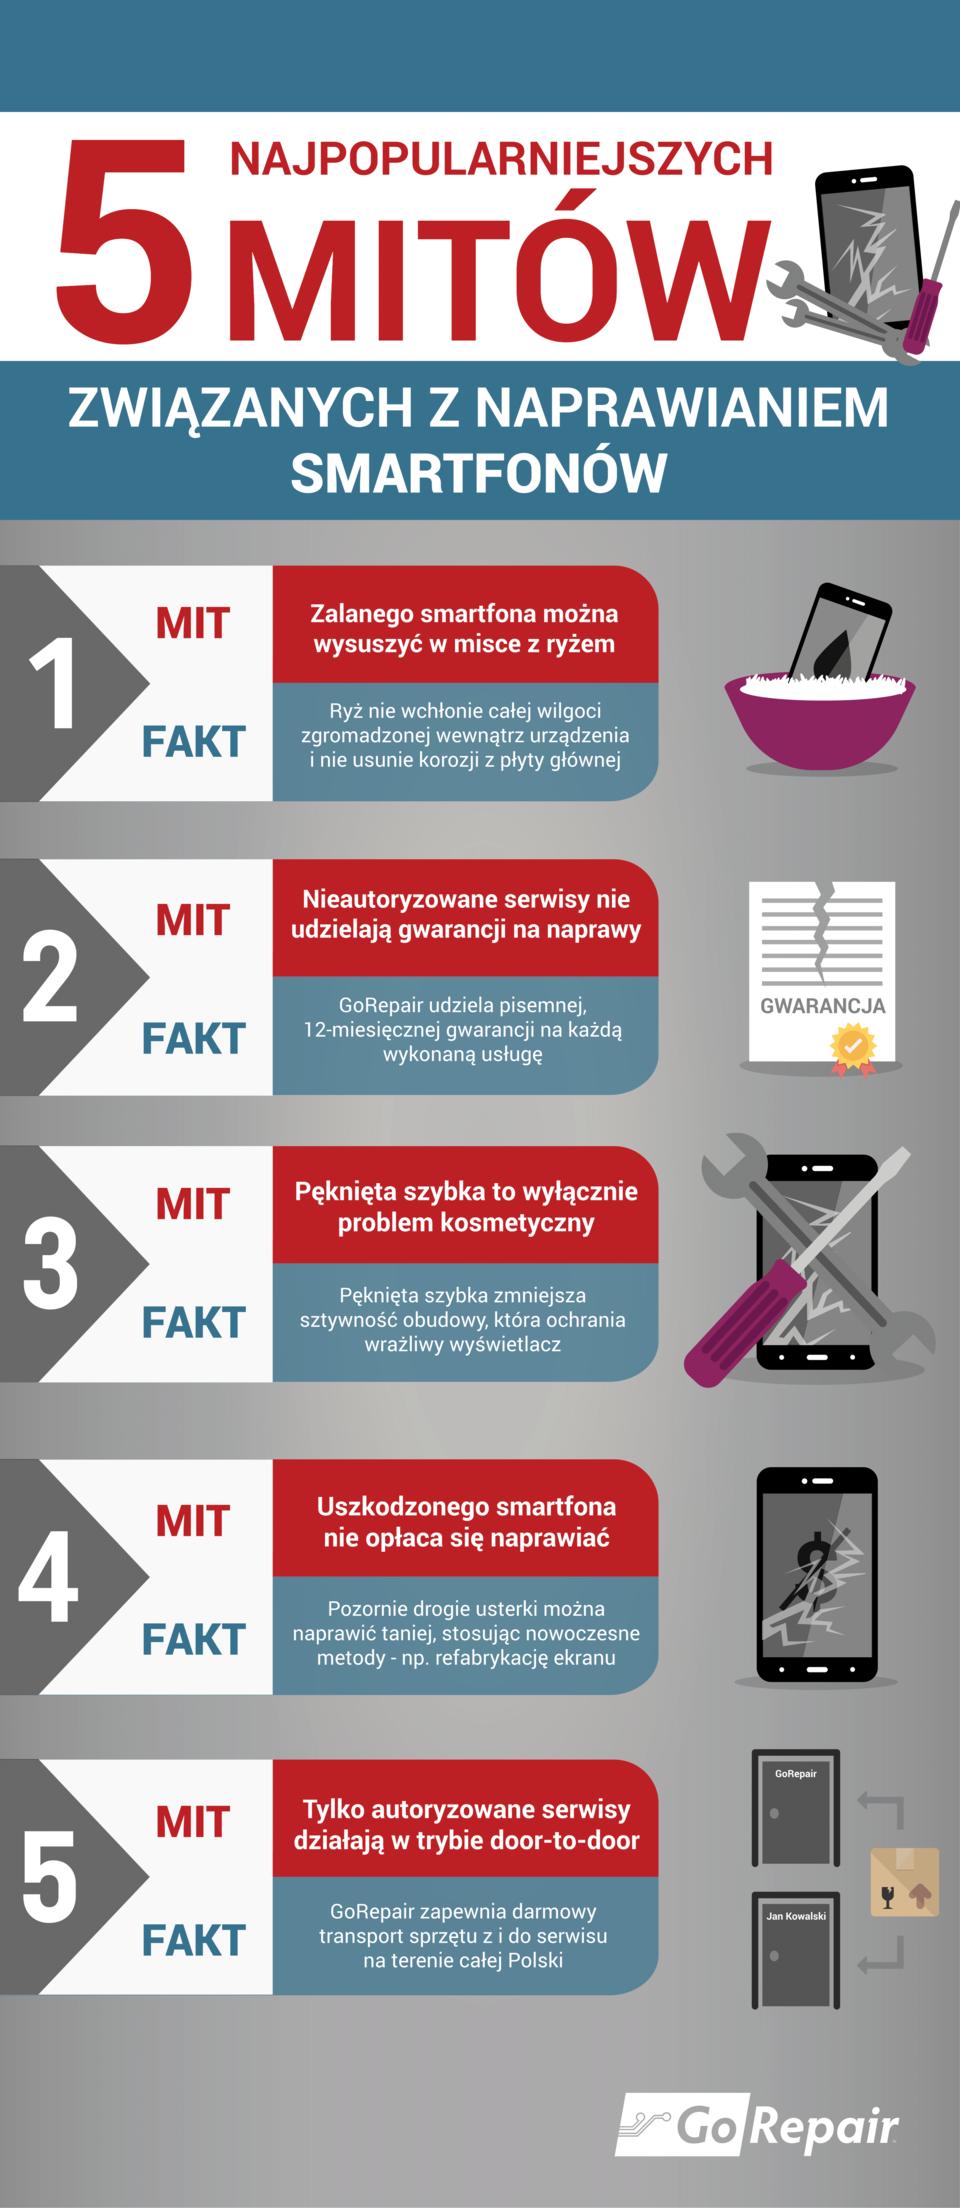 gorepair-infografika-obalamy-5-mitow-naprawa-smartfonow.png